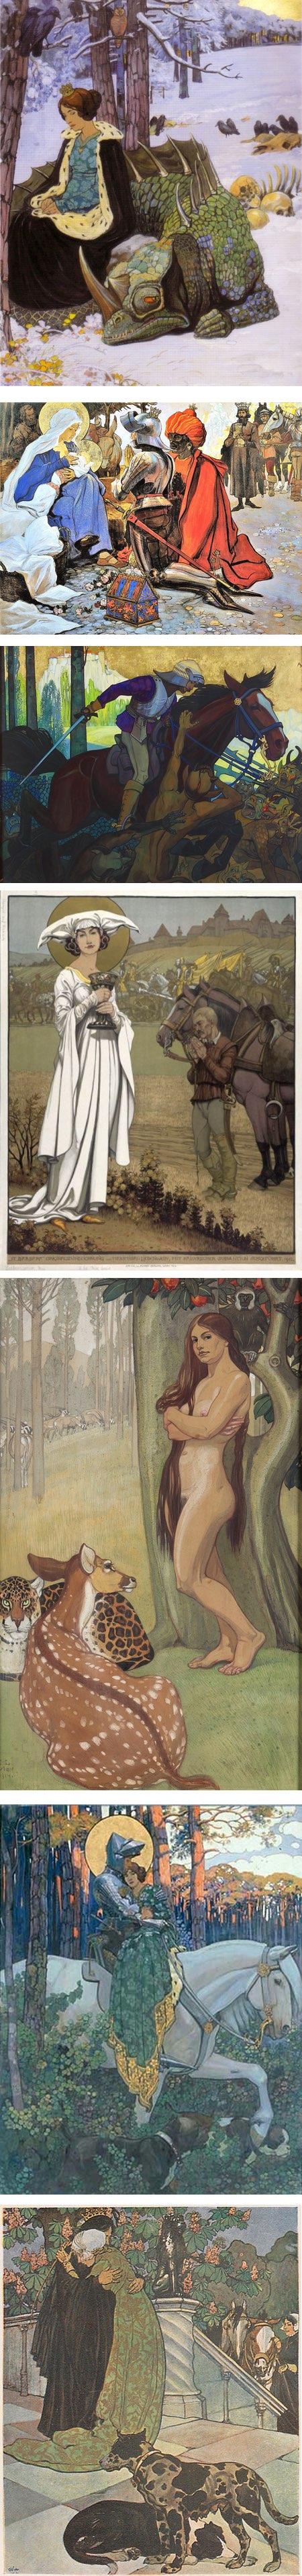 Maximilian Liebenwein, classic illustration